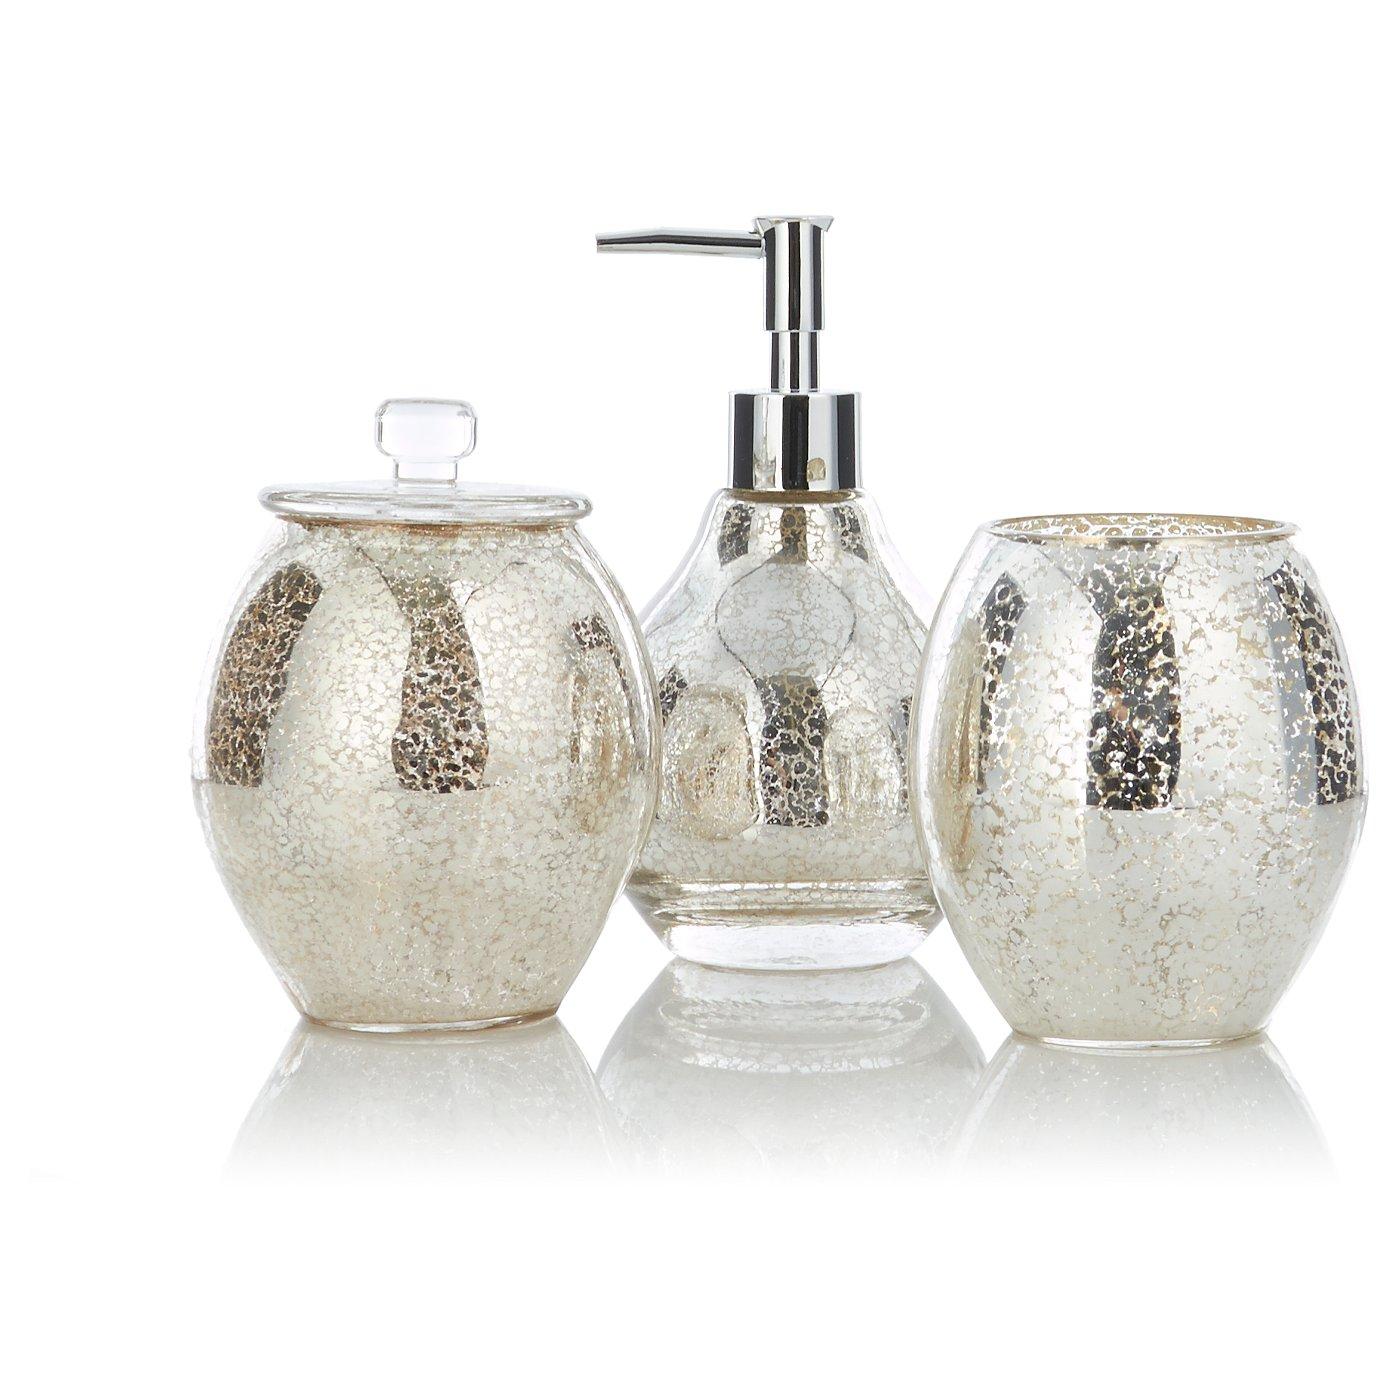 Mercury Glass Bathroom Accessories. George Home Accessories Mercury Glass Bathroom Accessories George At Asda